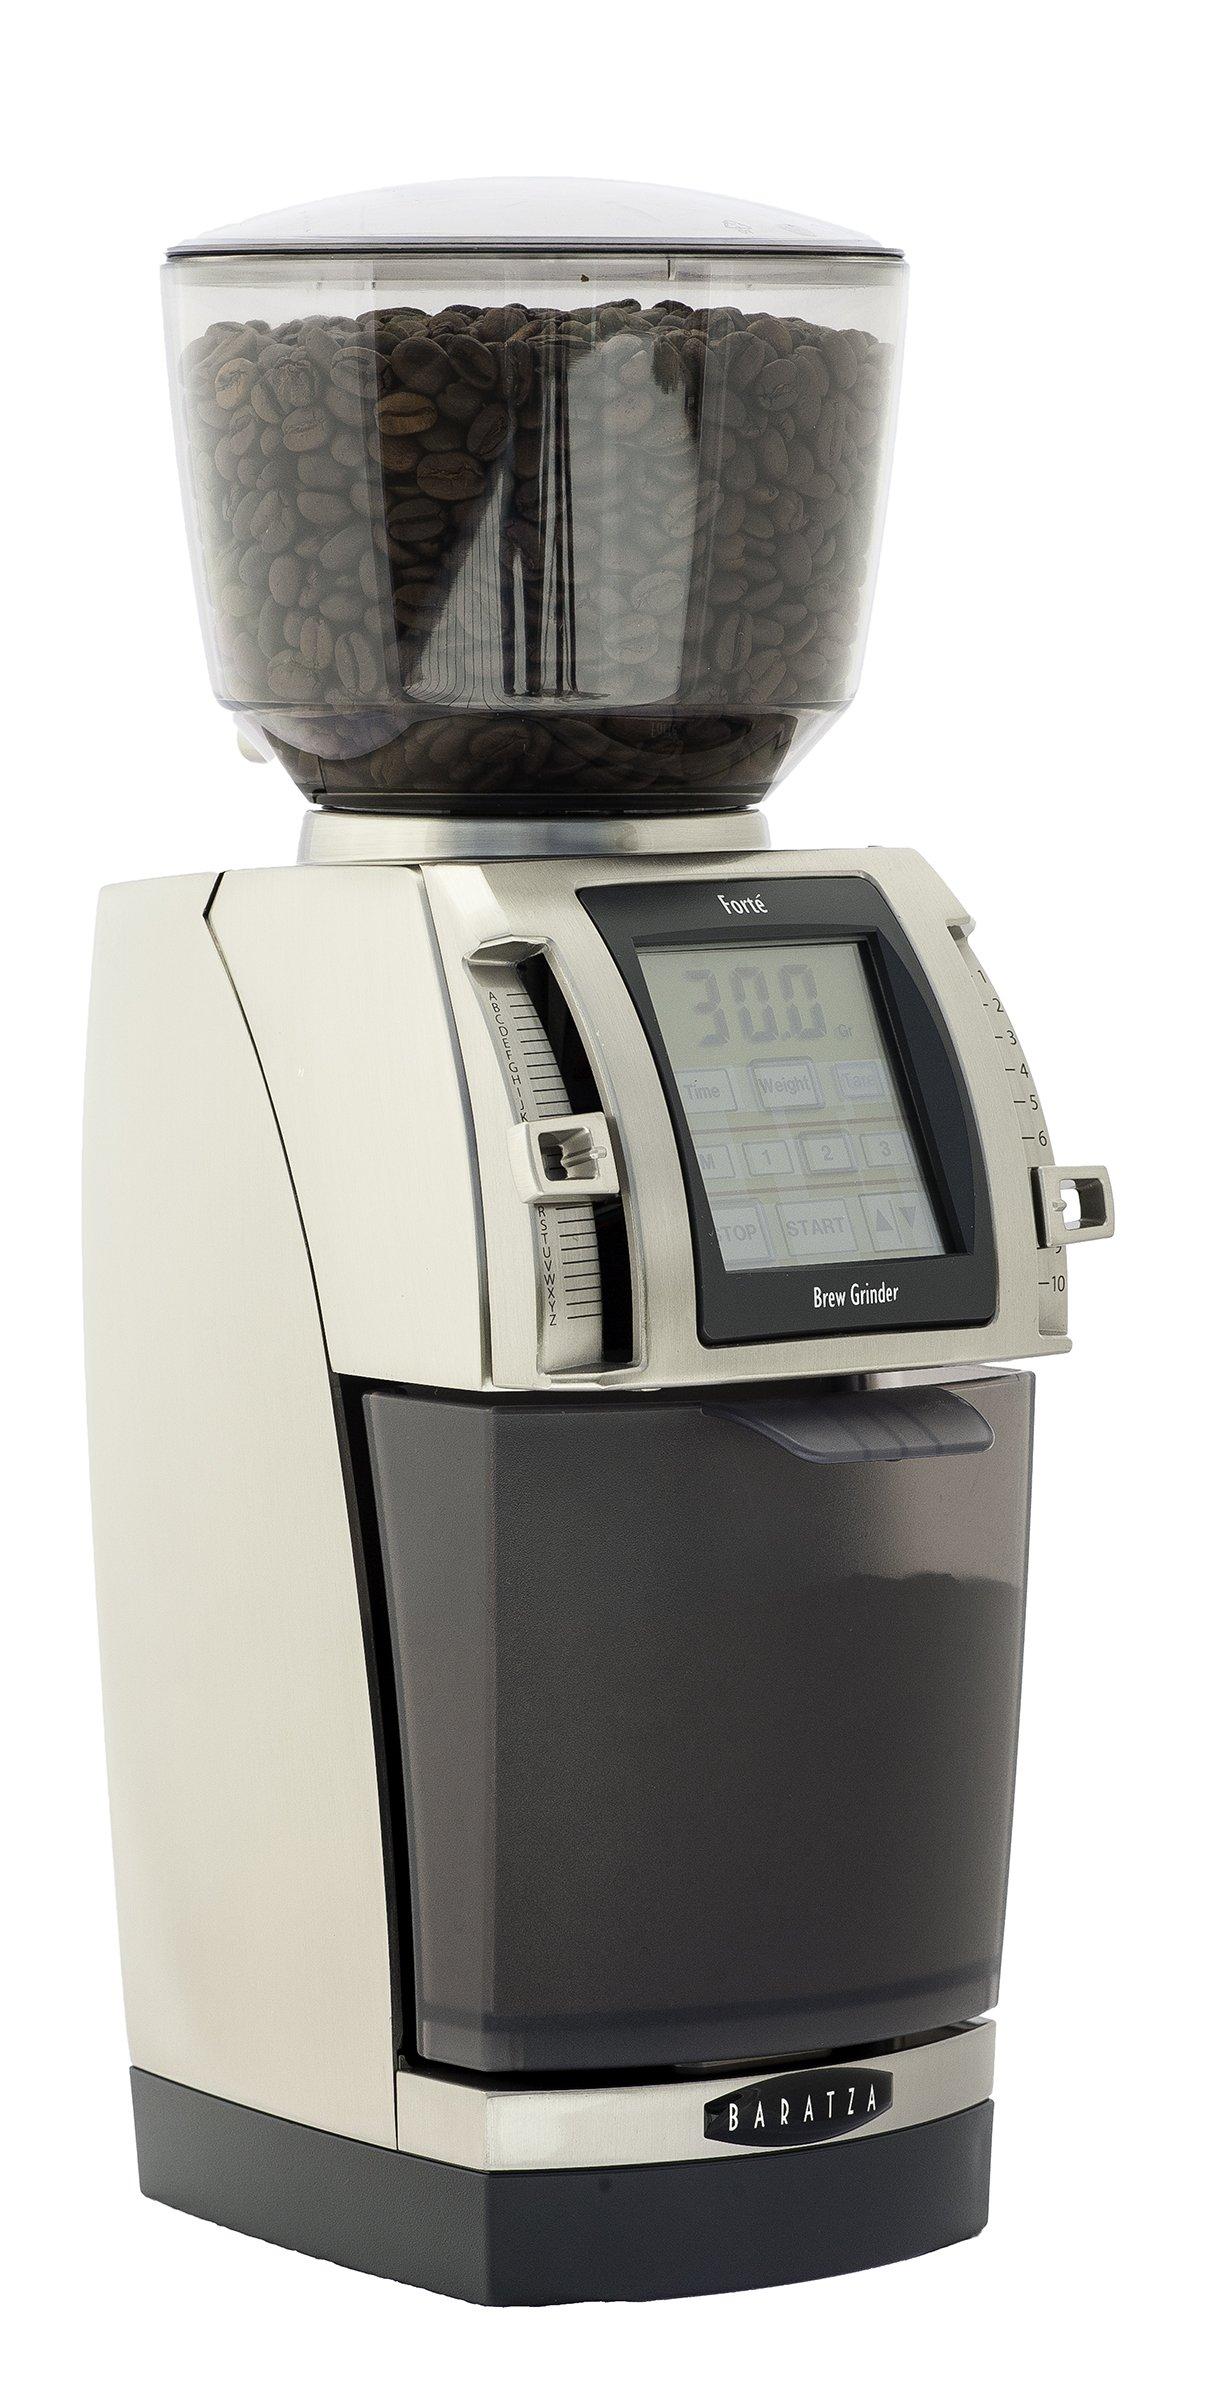 Baratza Forte BG (Brew Grinder) - Flat Steel Burr Commercial Grade Coffee Grinder by Baratza